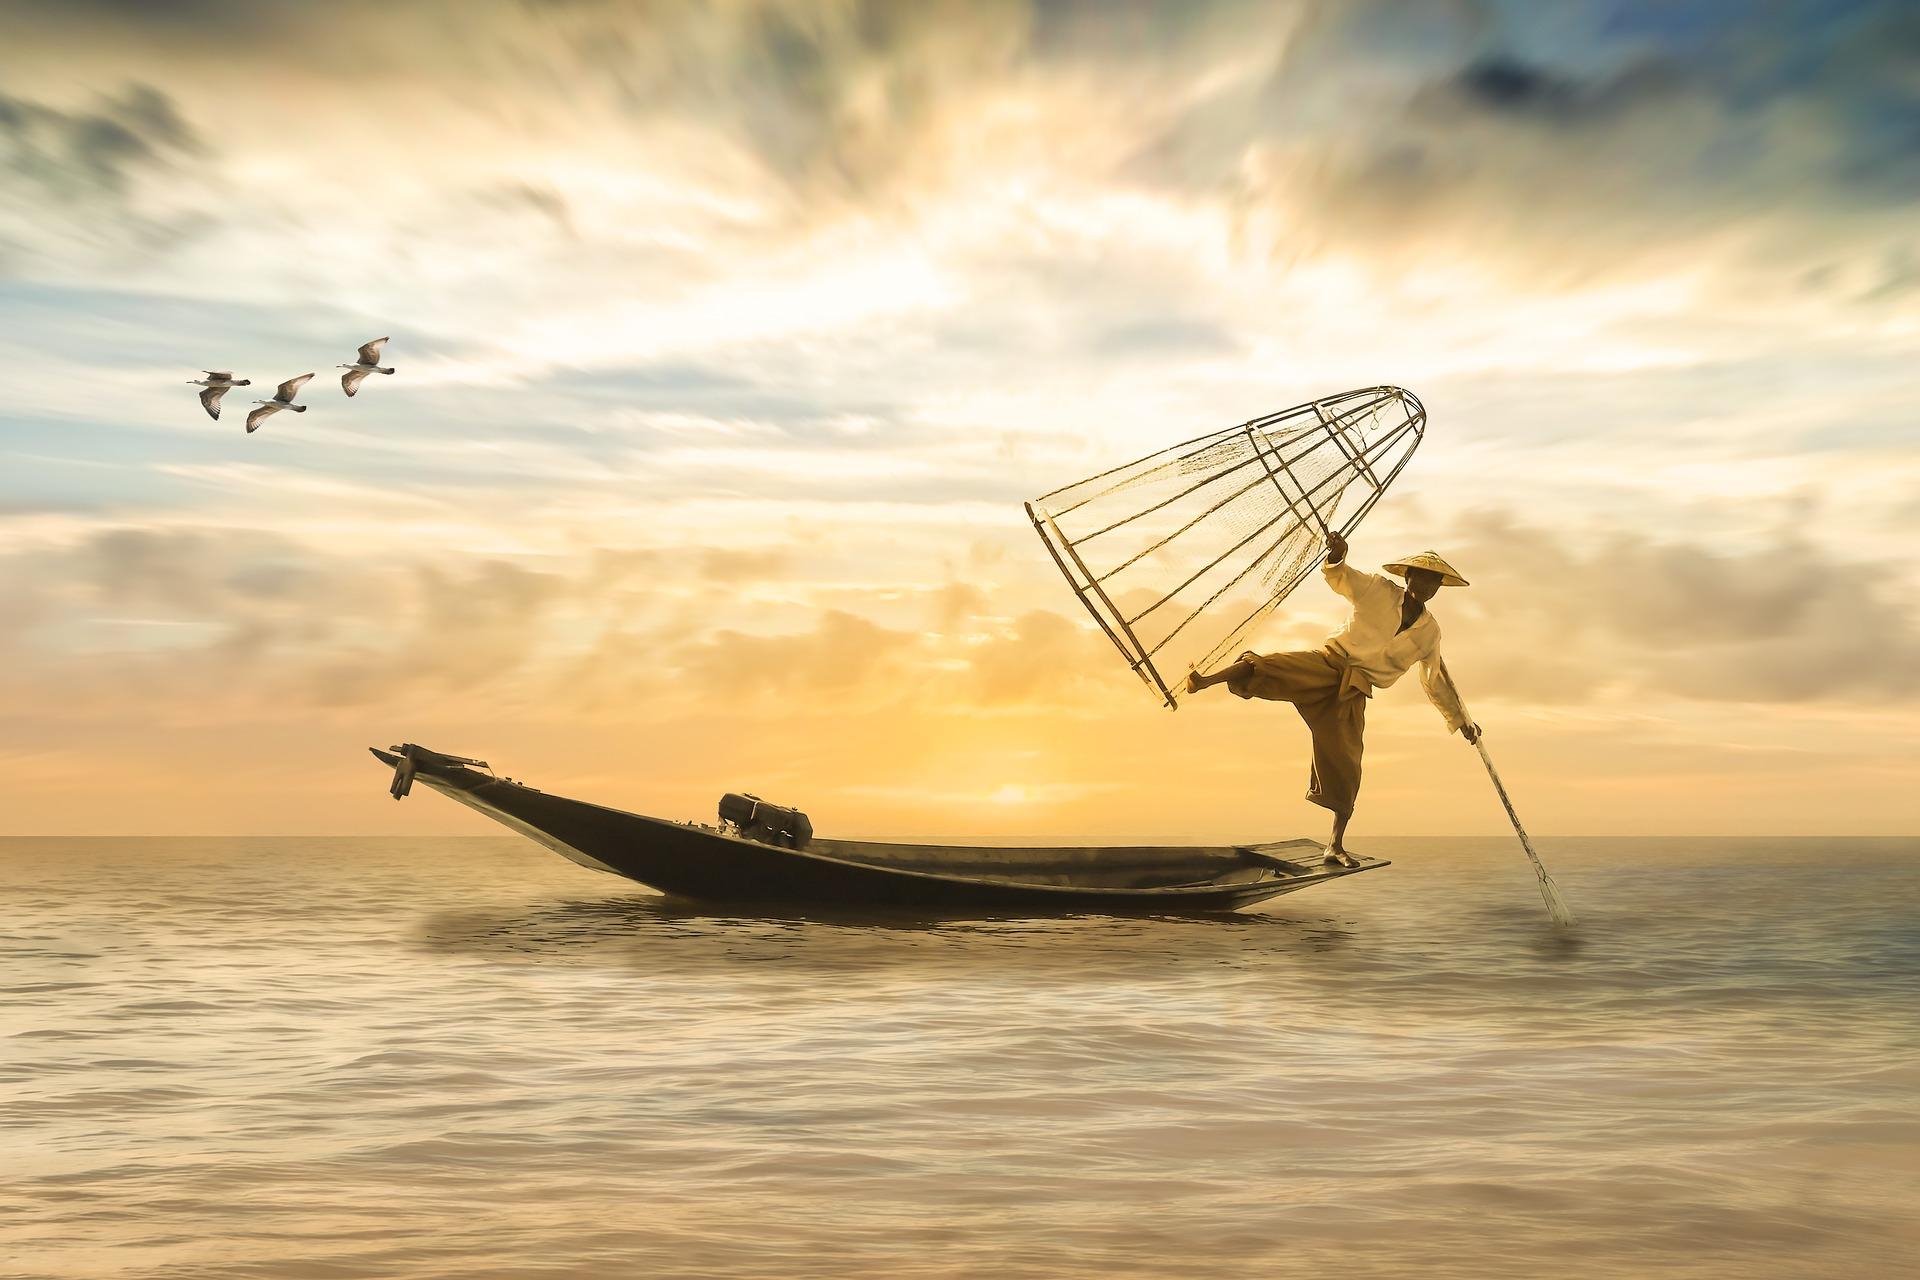 zodiac chinezesc saptamanal - sfatulparintilor.ro - pixabay-com - fisherman-2739115_1920